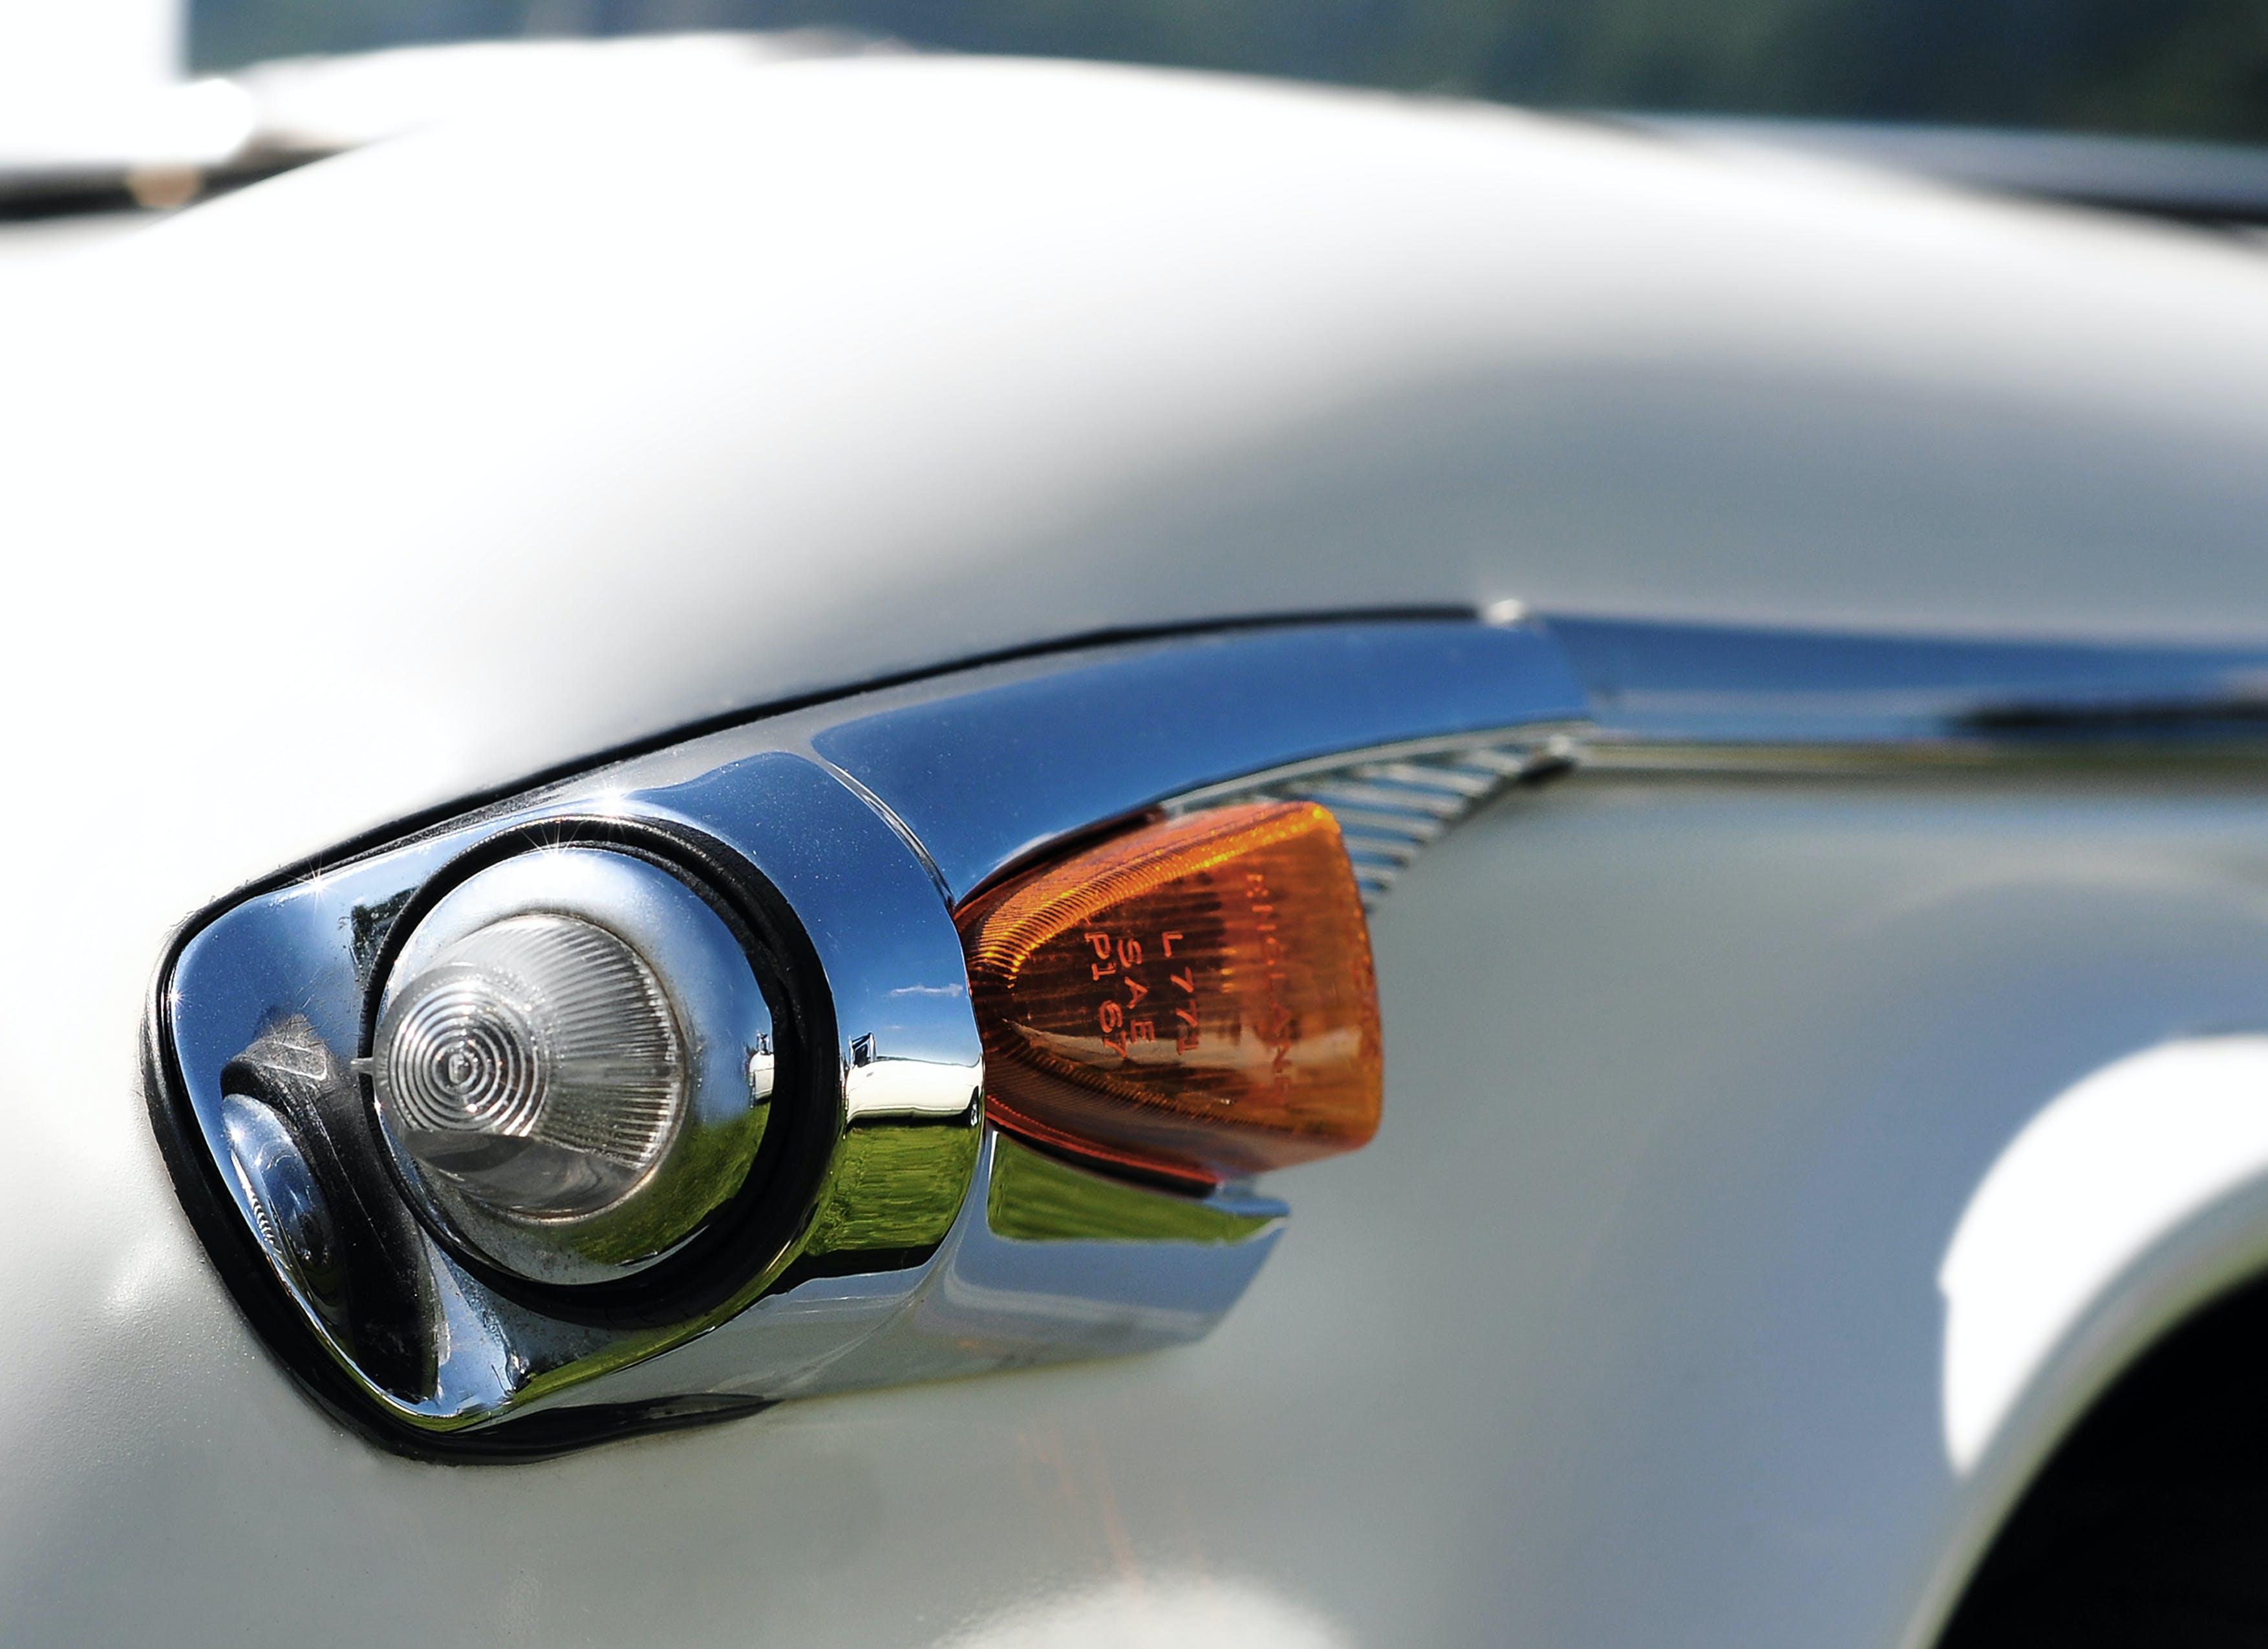 Free stock photo of classic car, detail, indicator light, Triumph TR5